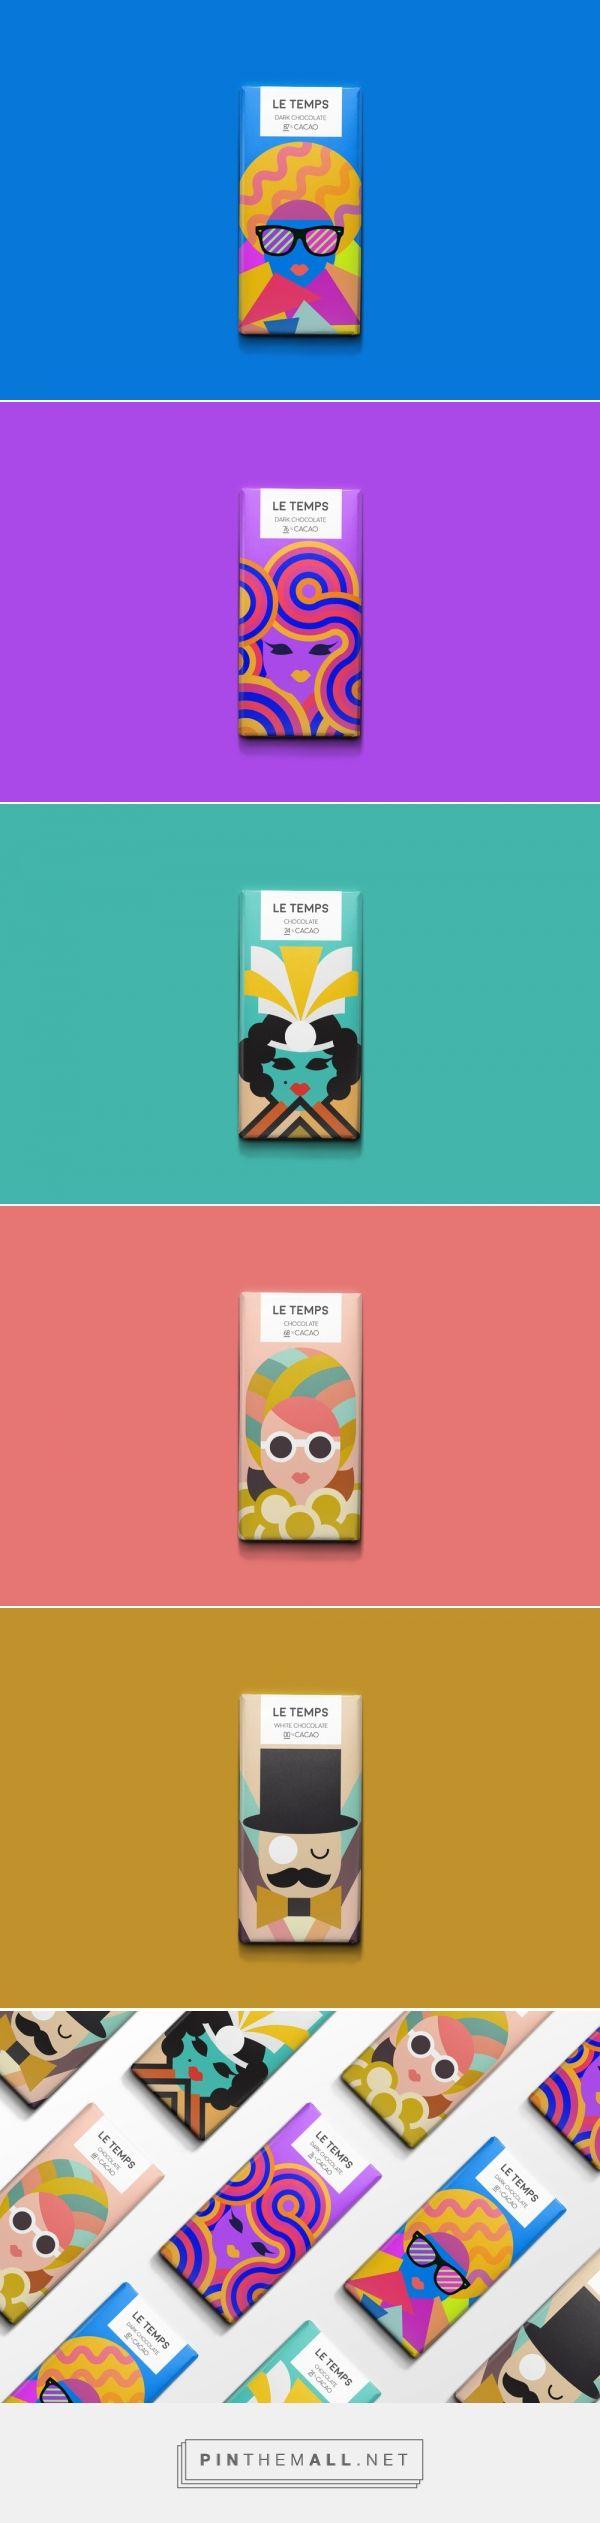 Le Temps Chocolate / concept / designed by Meeta Panesar